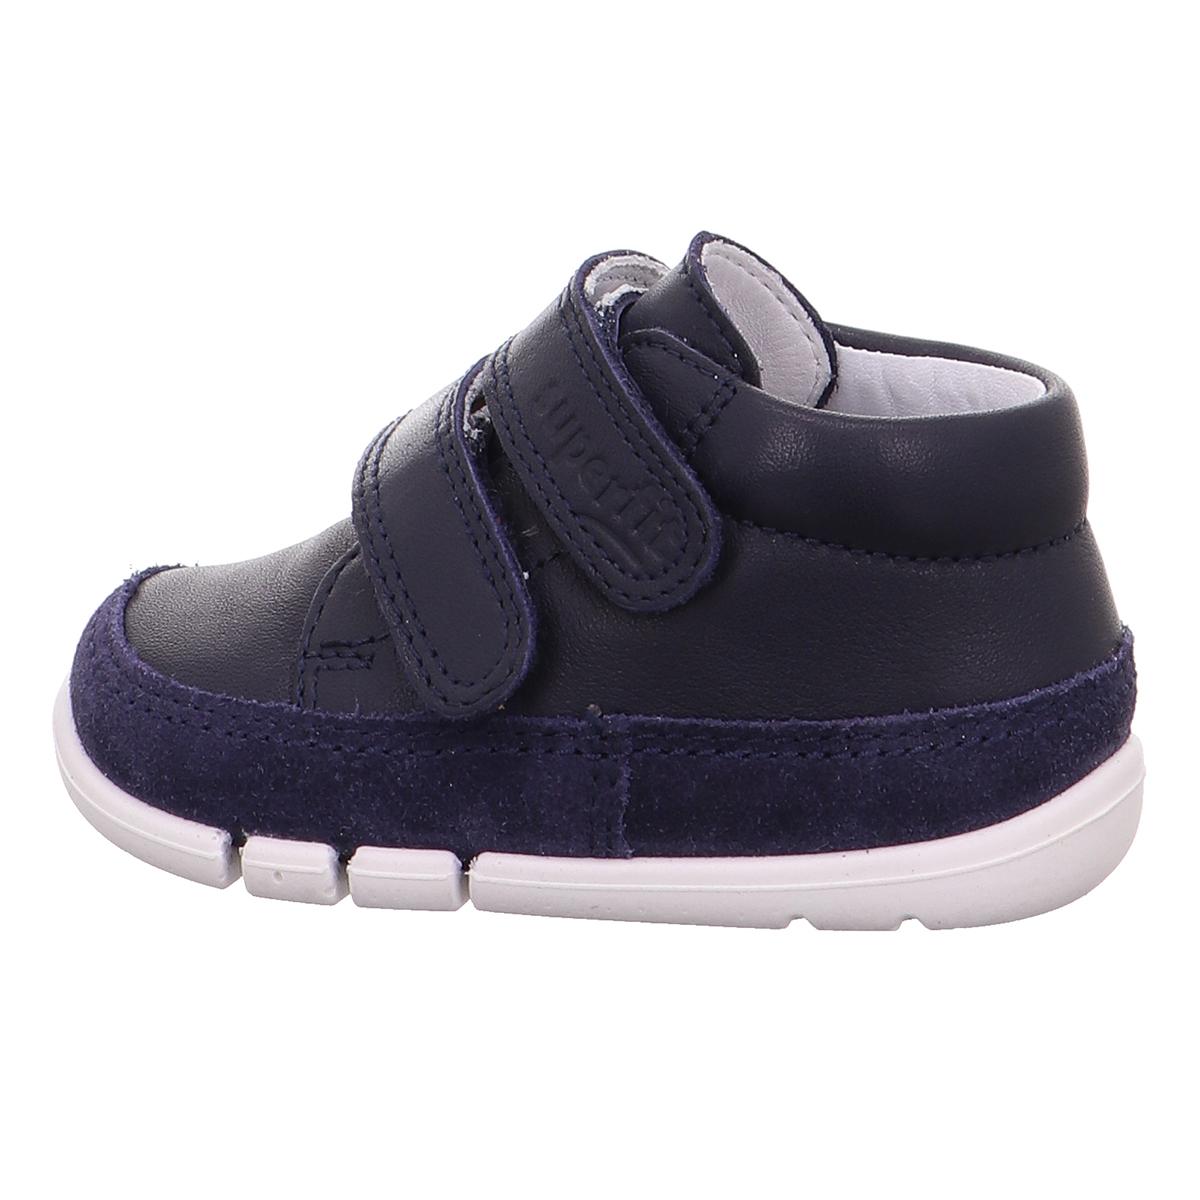 Купить Пинетки-ботинки Superfit Sport Blue, р. 20 1-006341-8000 ТМ: Superfit, синий